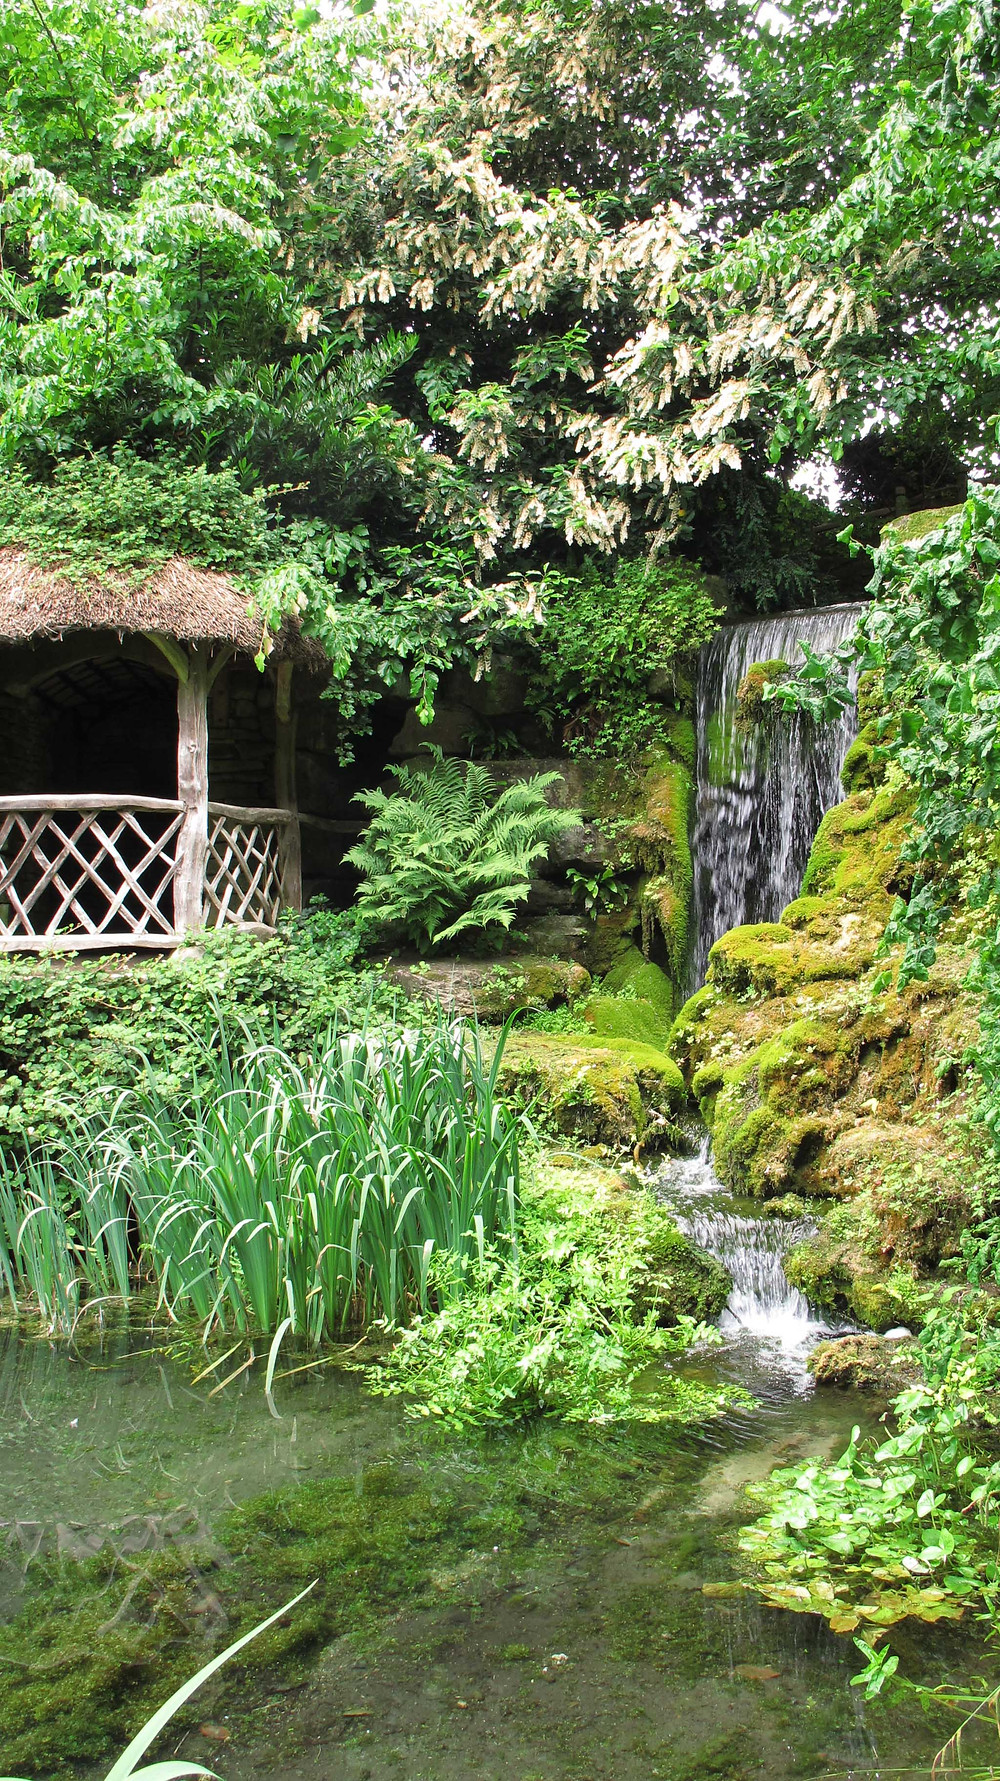 secret garden, waterfall, gazebo, pond, moss, romantic garden, water garden, hampton court,